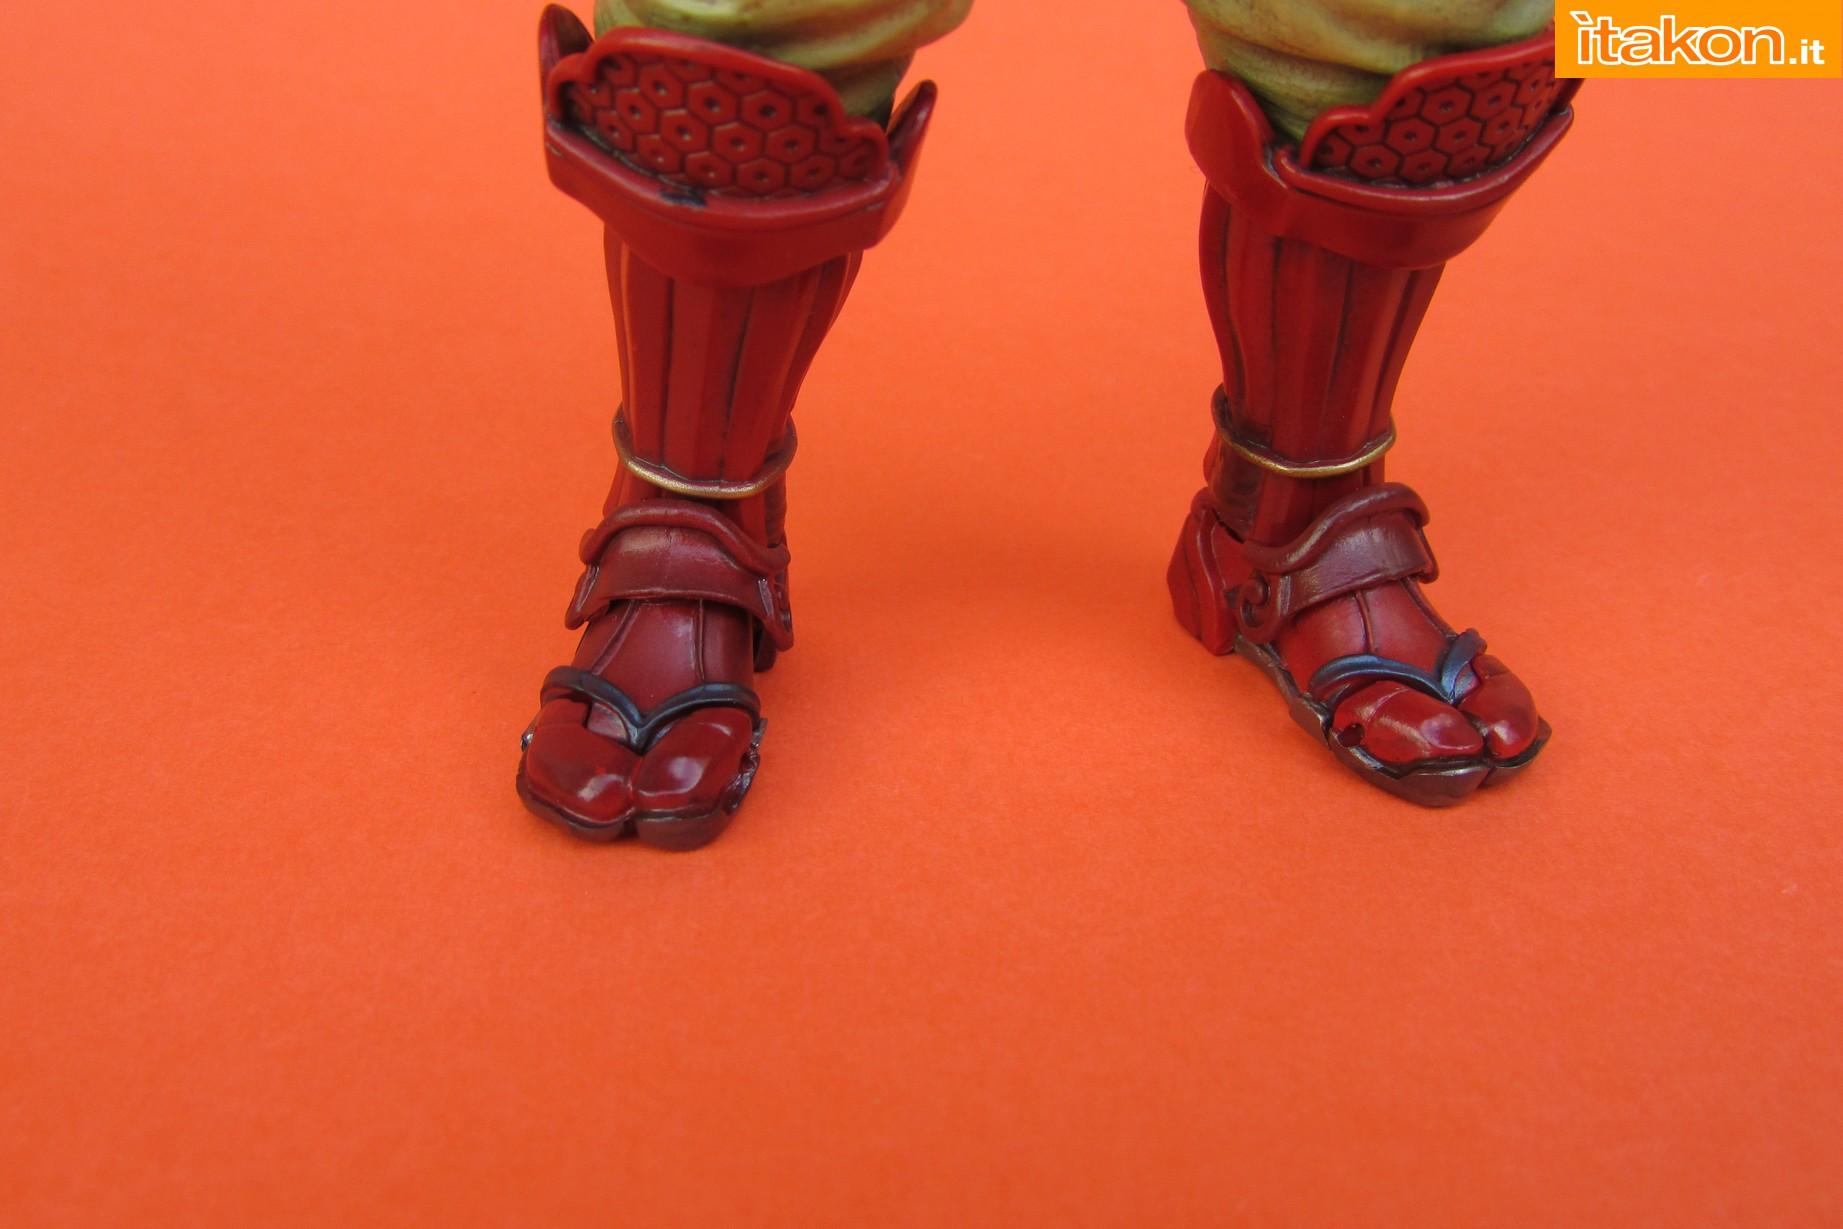 Link a Marvel Comics Koutetsu Samurai Iron Man Mark 3 Meishou MANGA REALIZATION review Bandai Itakon.it18